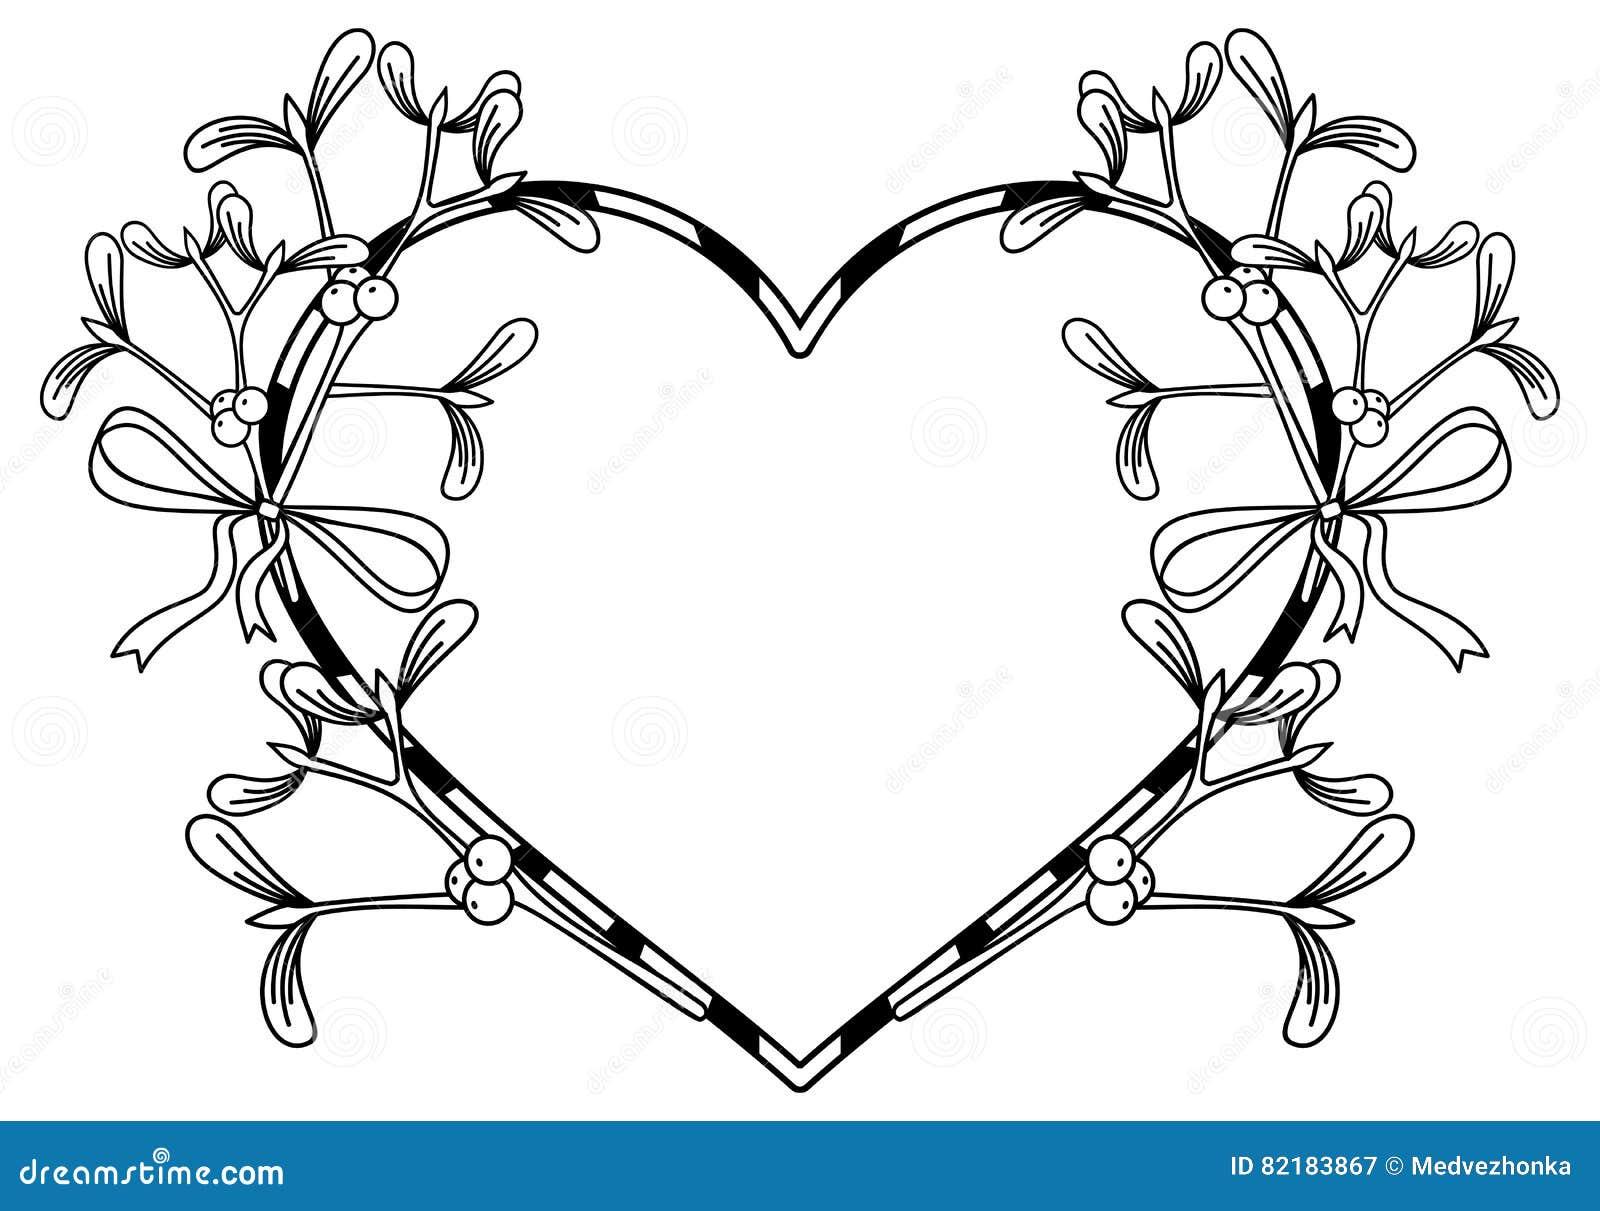 Heart shaped frame and mistletoe stock image image of loop royalty free stock photo buycottarizona Image collections